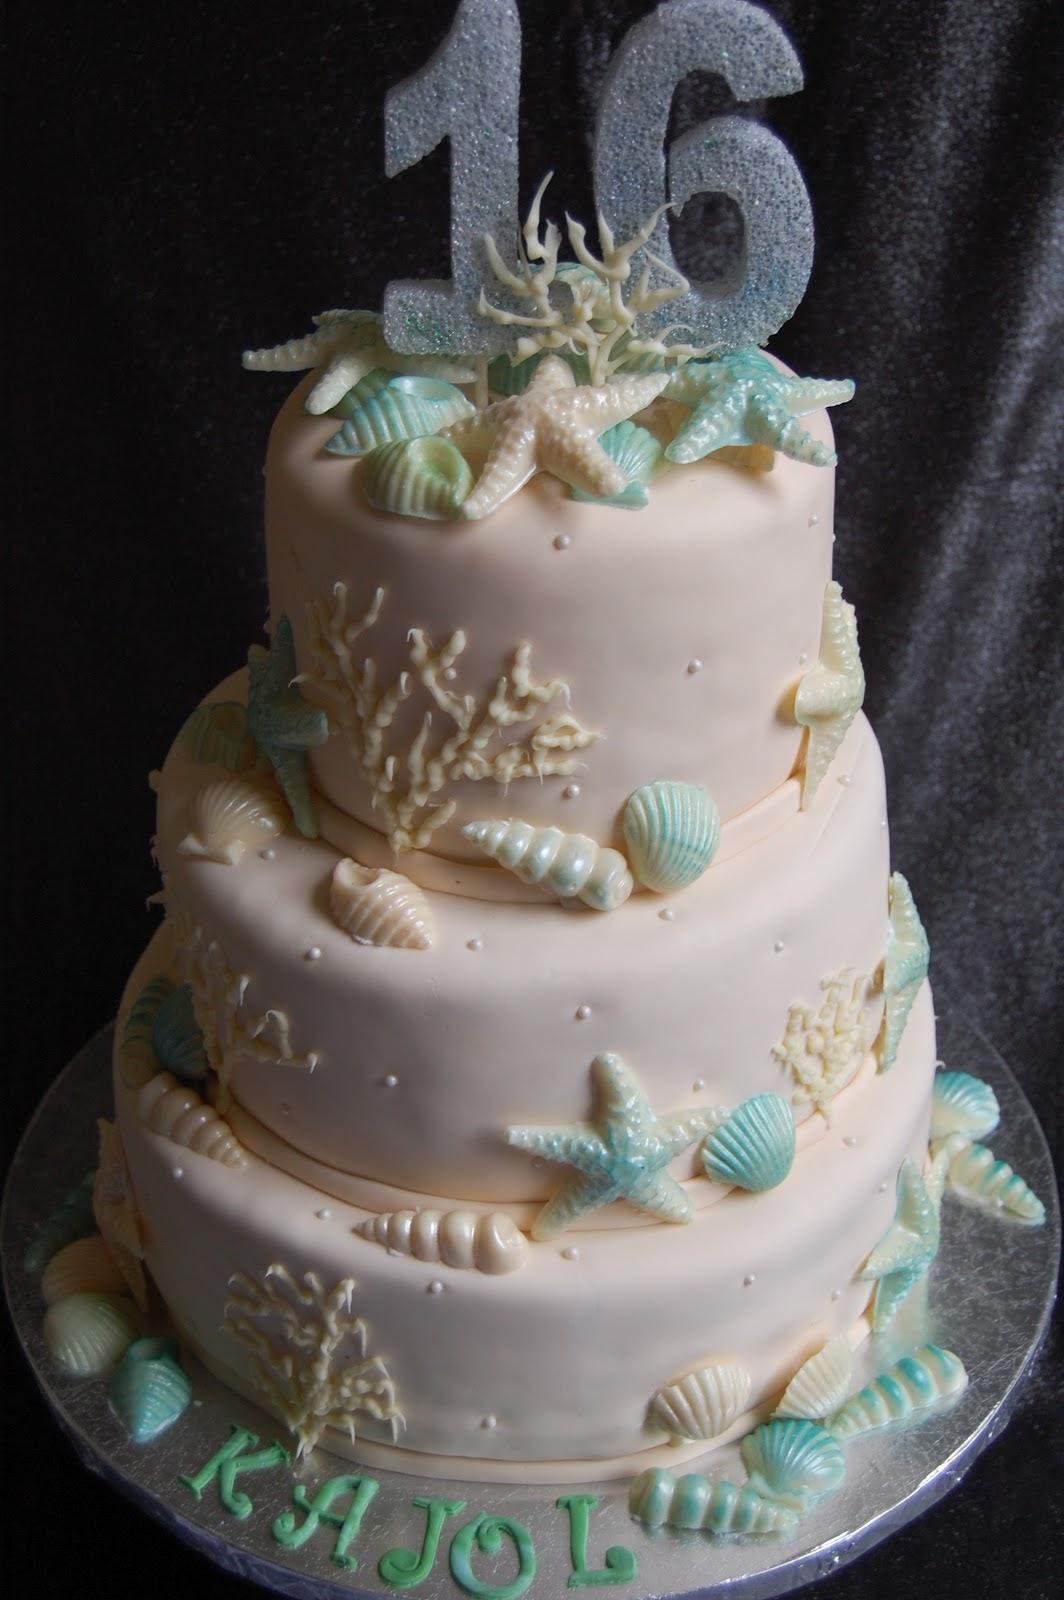 Sweet 16 Cake Ideas : sweet, ideas, Sweet, Cakes, Decoration, Ideas, Little, Birthday